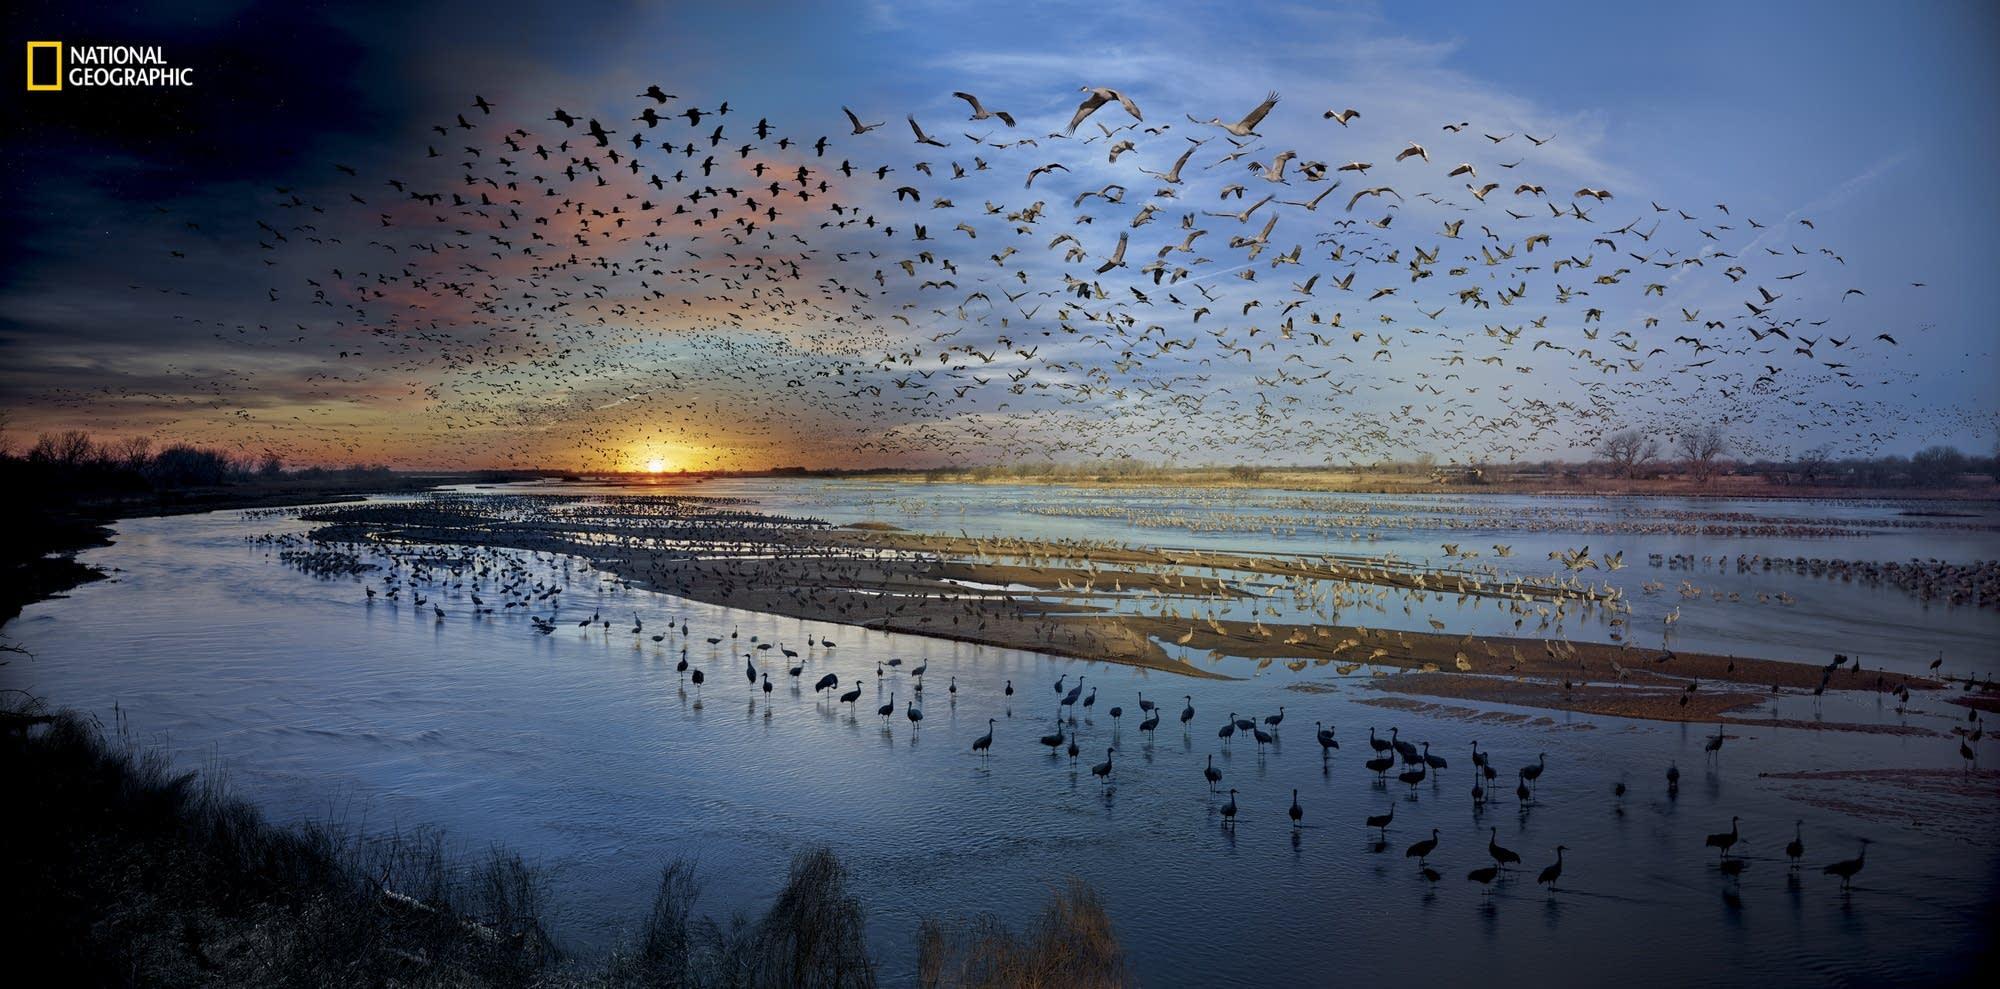 In spring, half a million sandhill cranes gather on the Platte River.